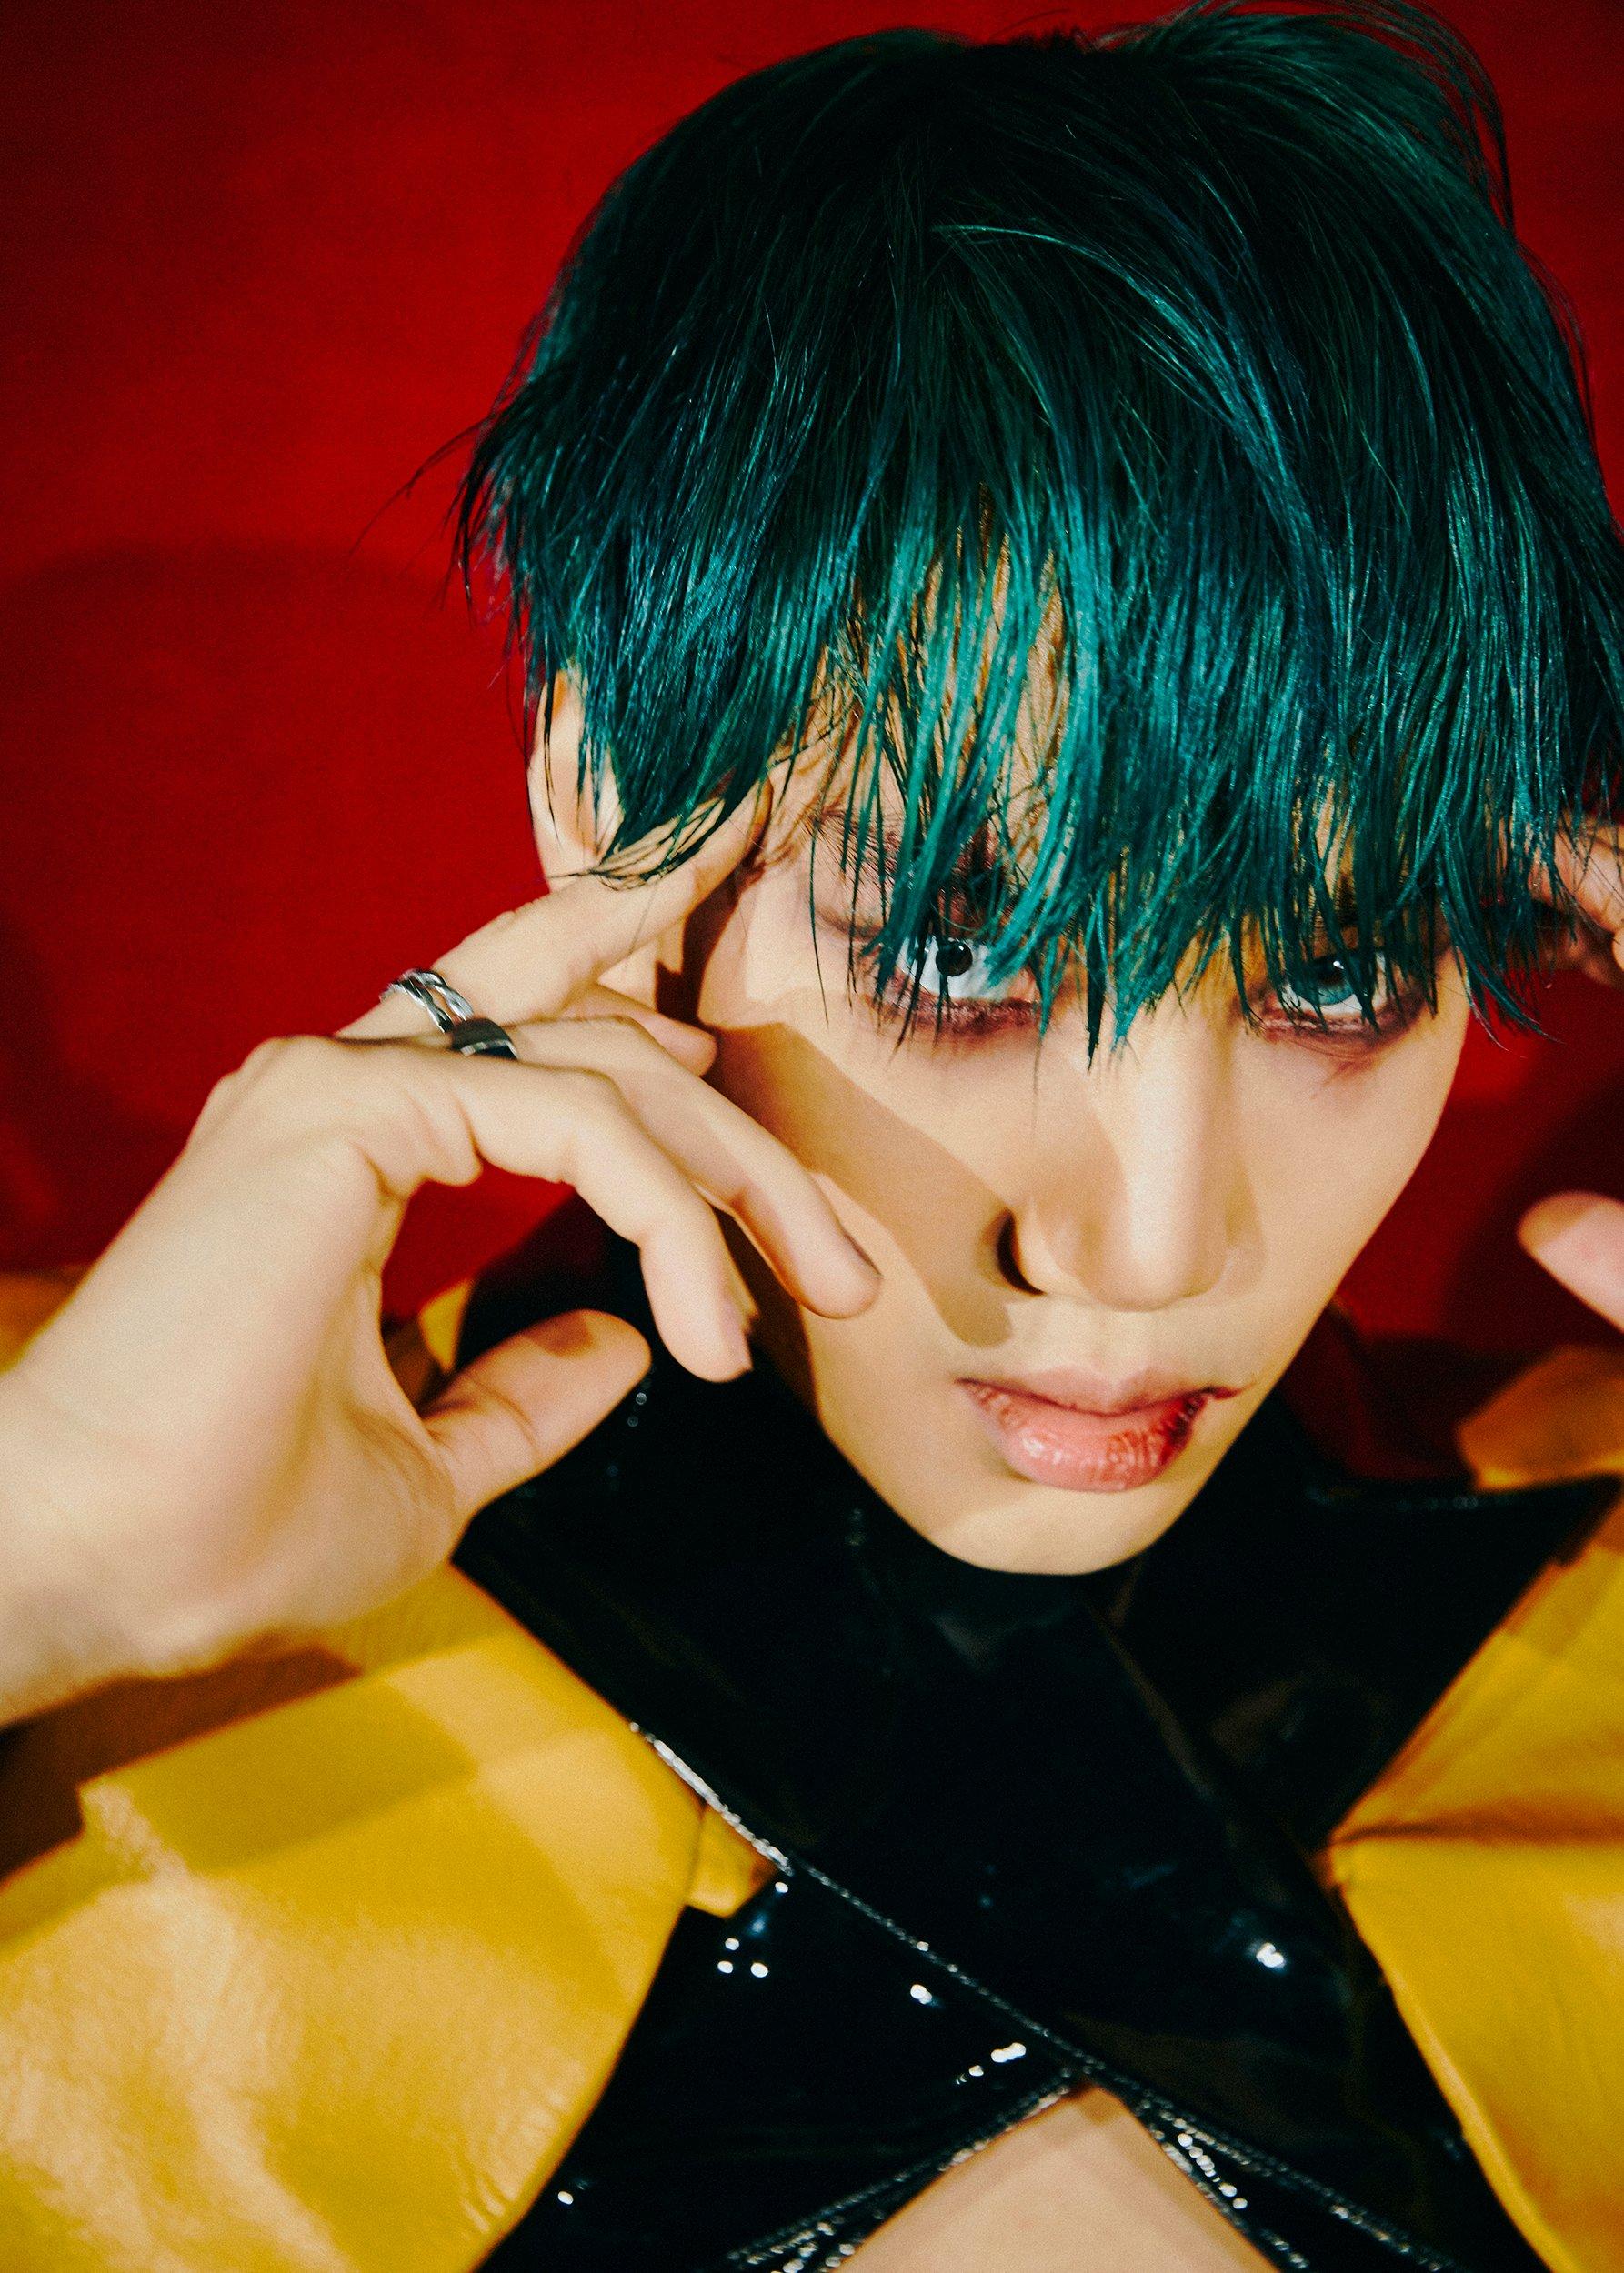 Exo Obsession X Exo Vs Exo Kai Teaser Photos Hd Hr K Pop Database Dbkpop Com